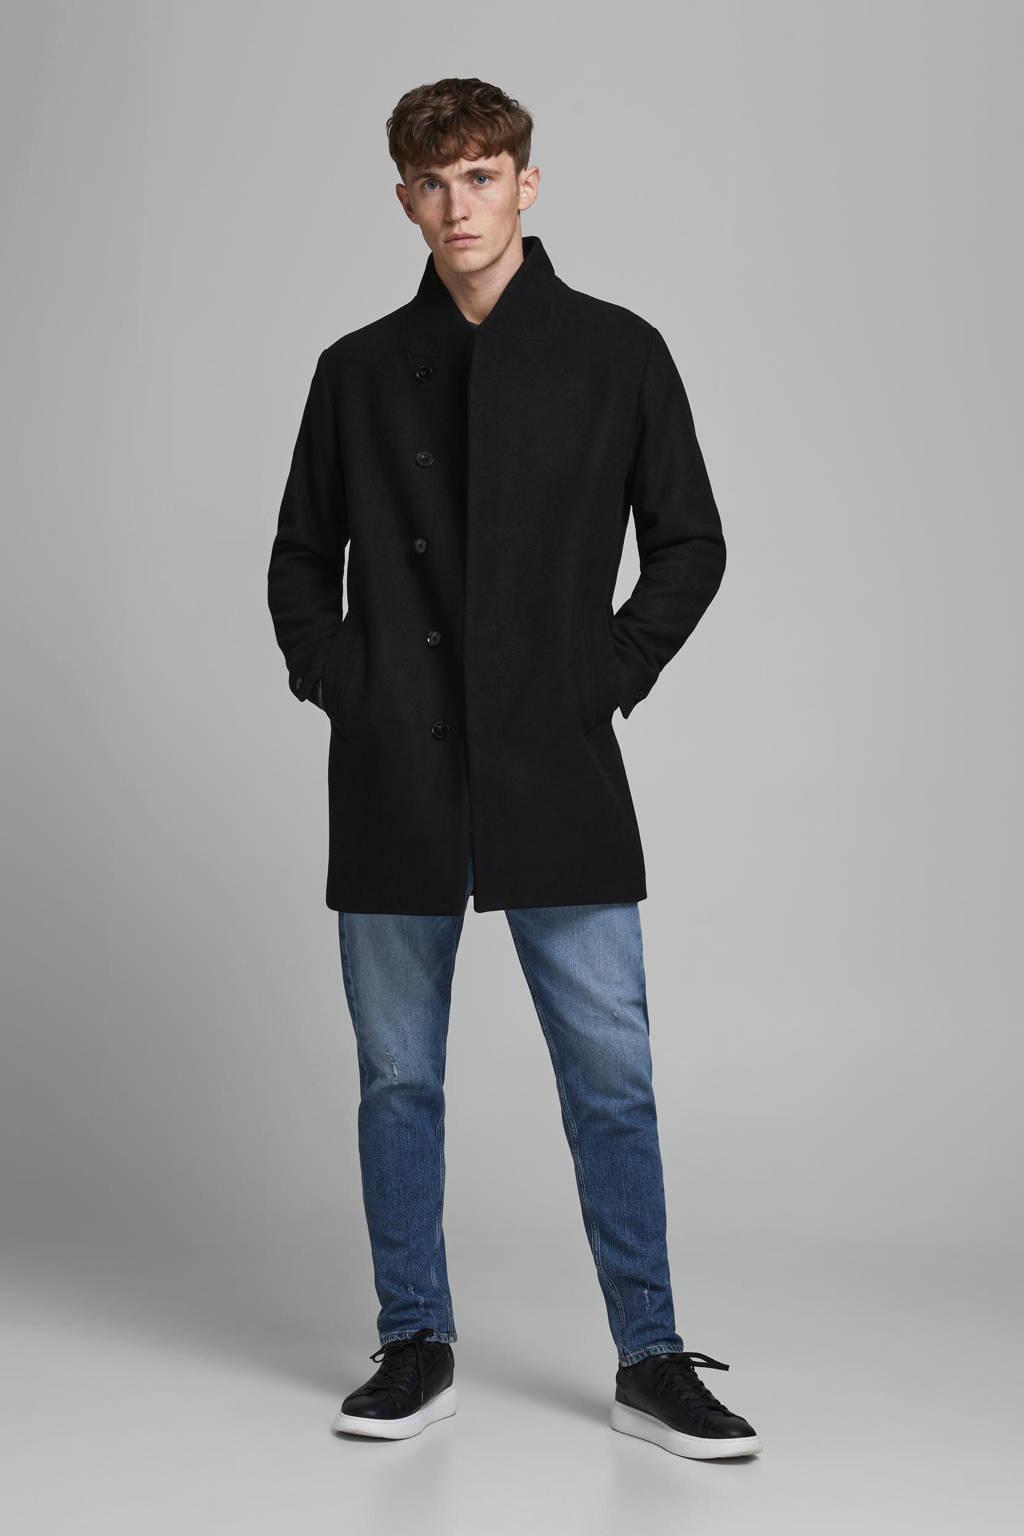 JACK & JONES ESSENTIALS Collum jas met wol zwart, Zwart